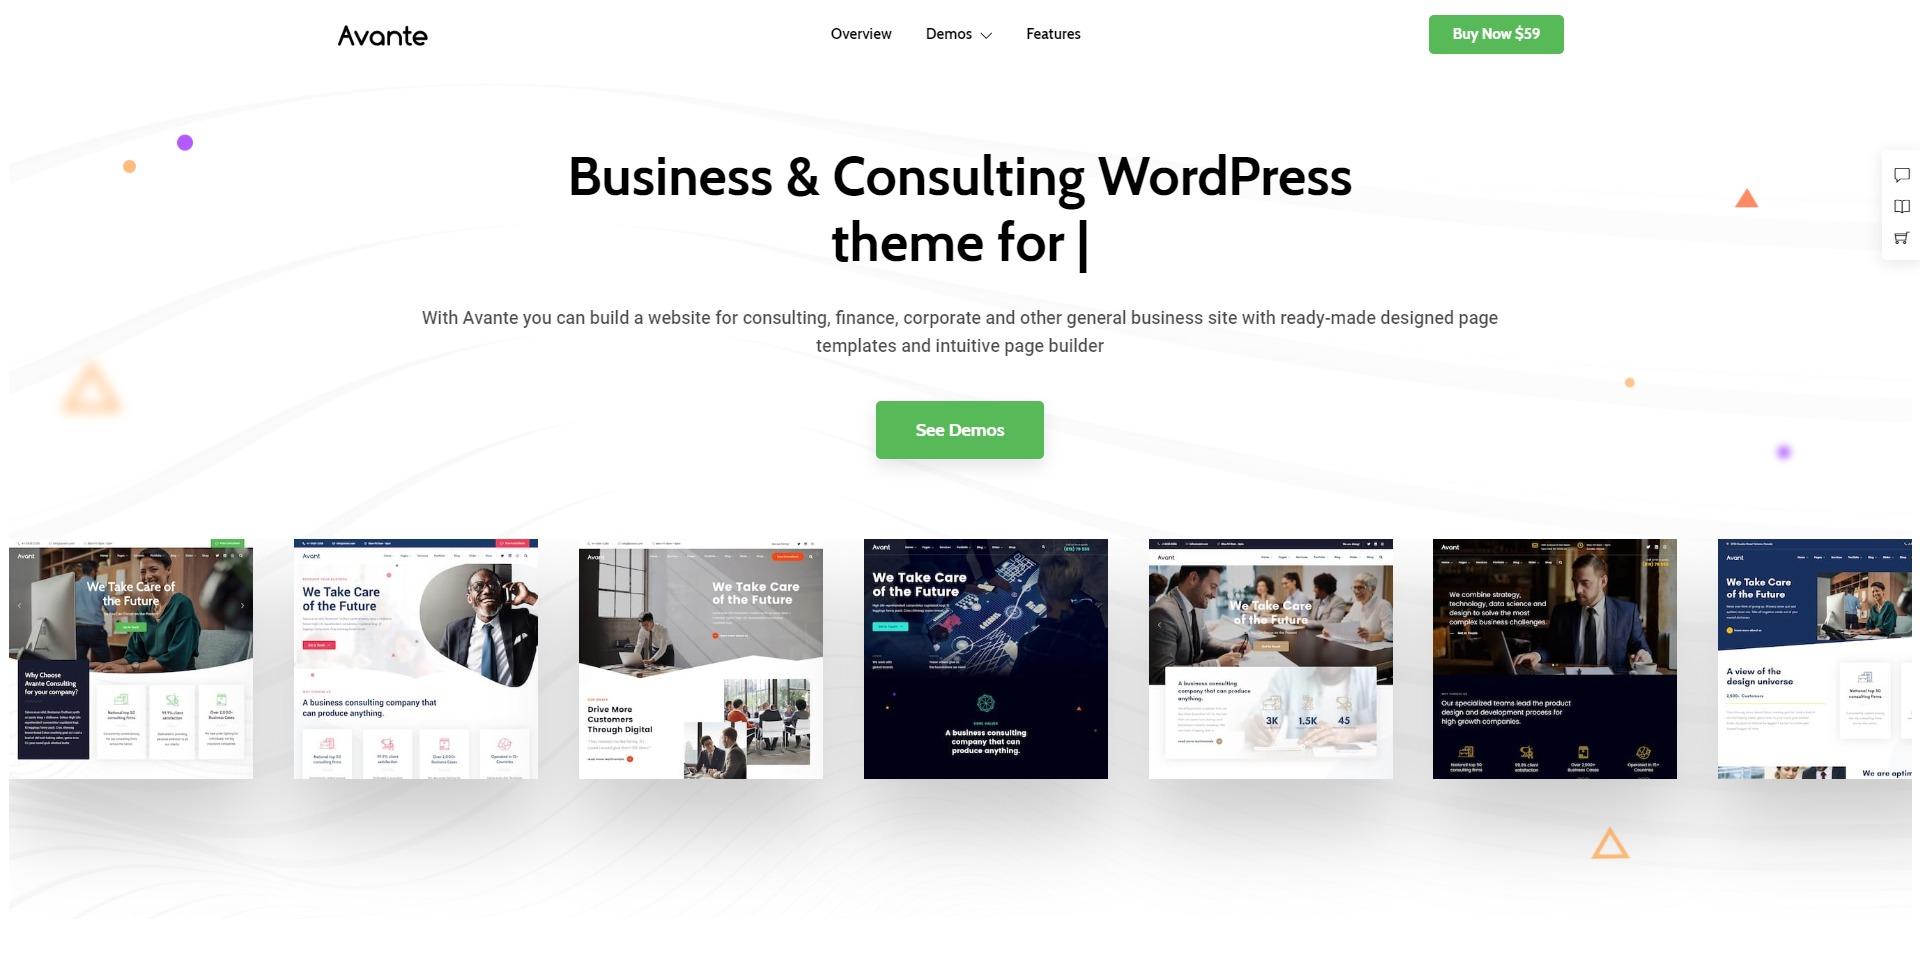 Avante-金融投资咨询财务企业WordPress主题